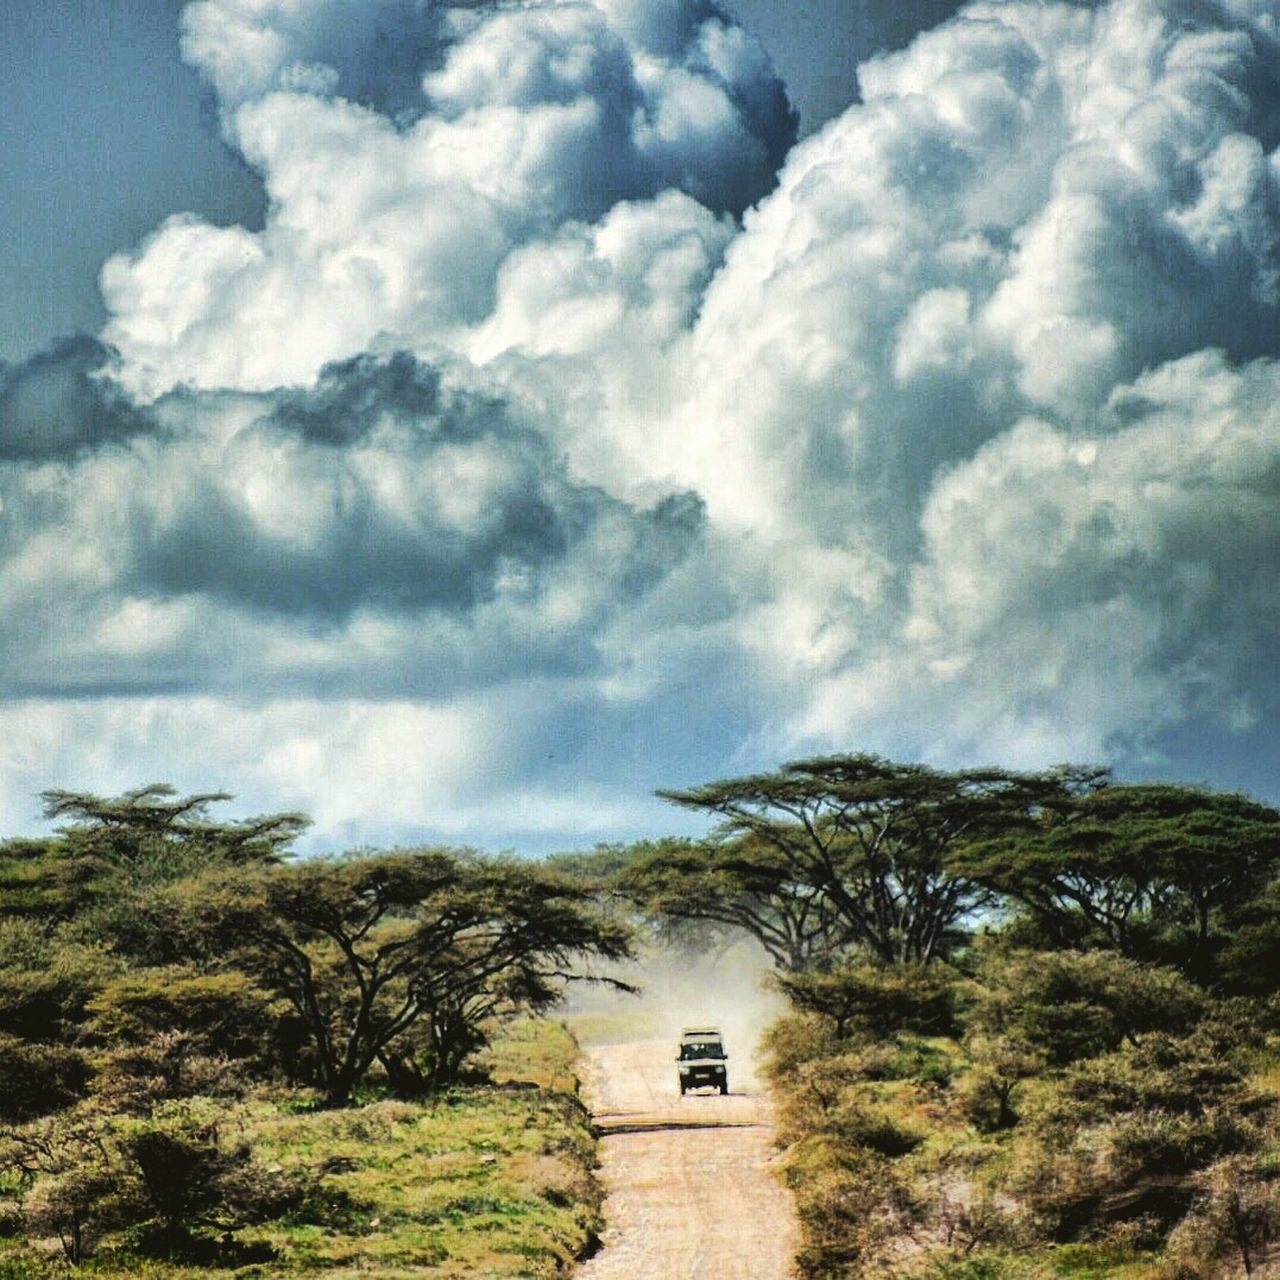 Safari Africa Storm